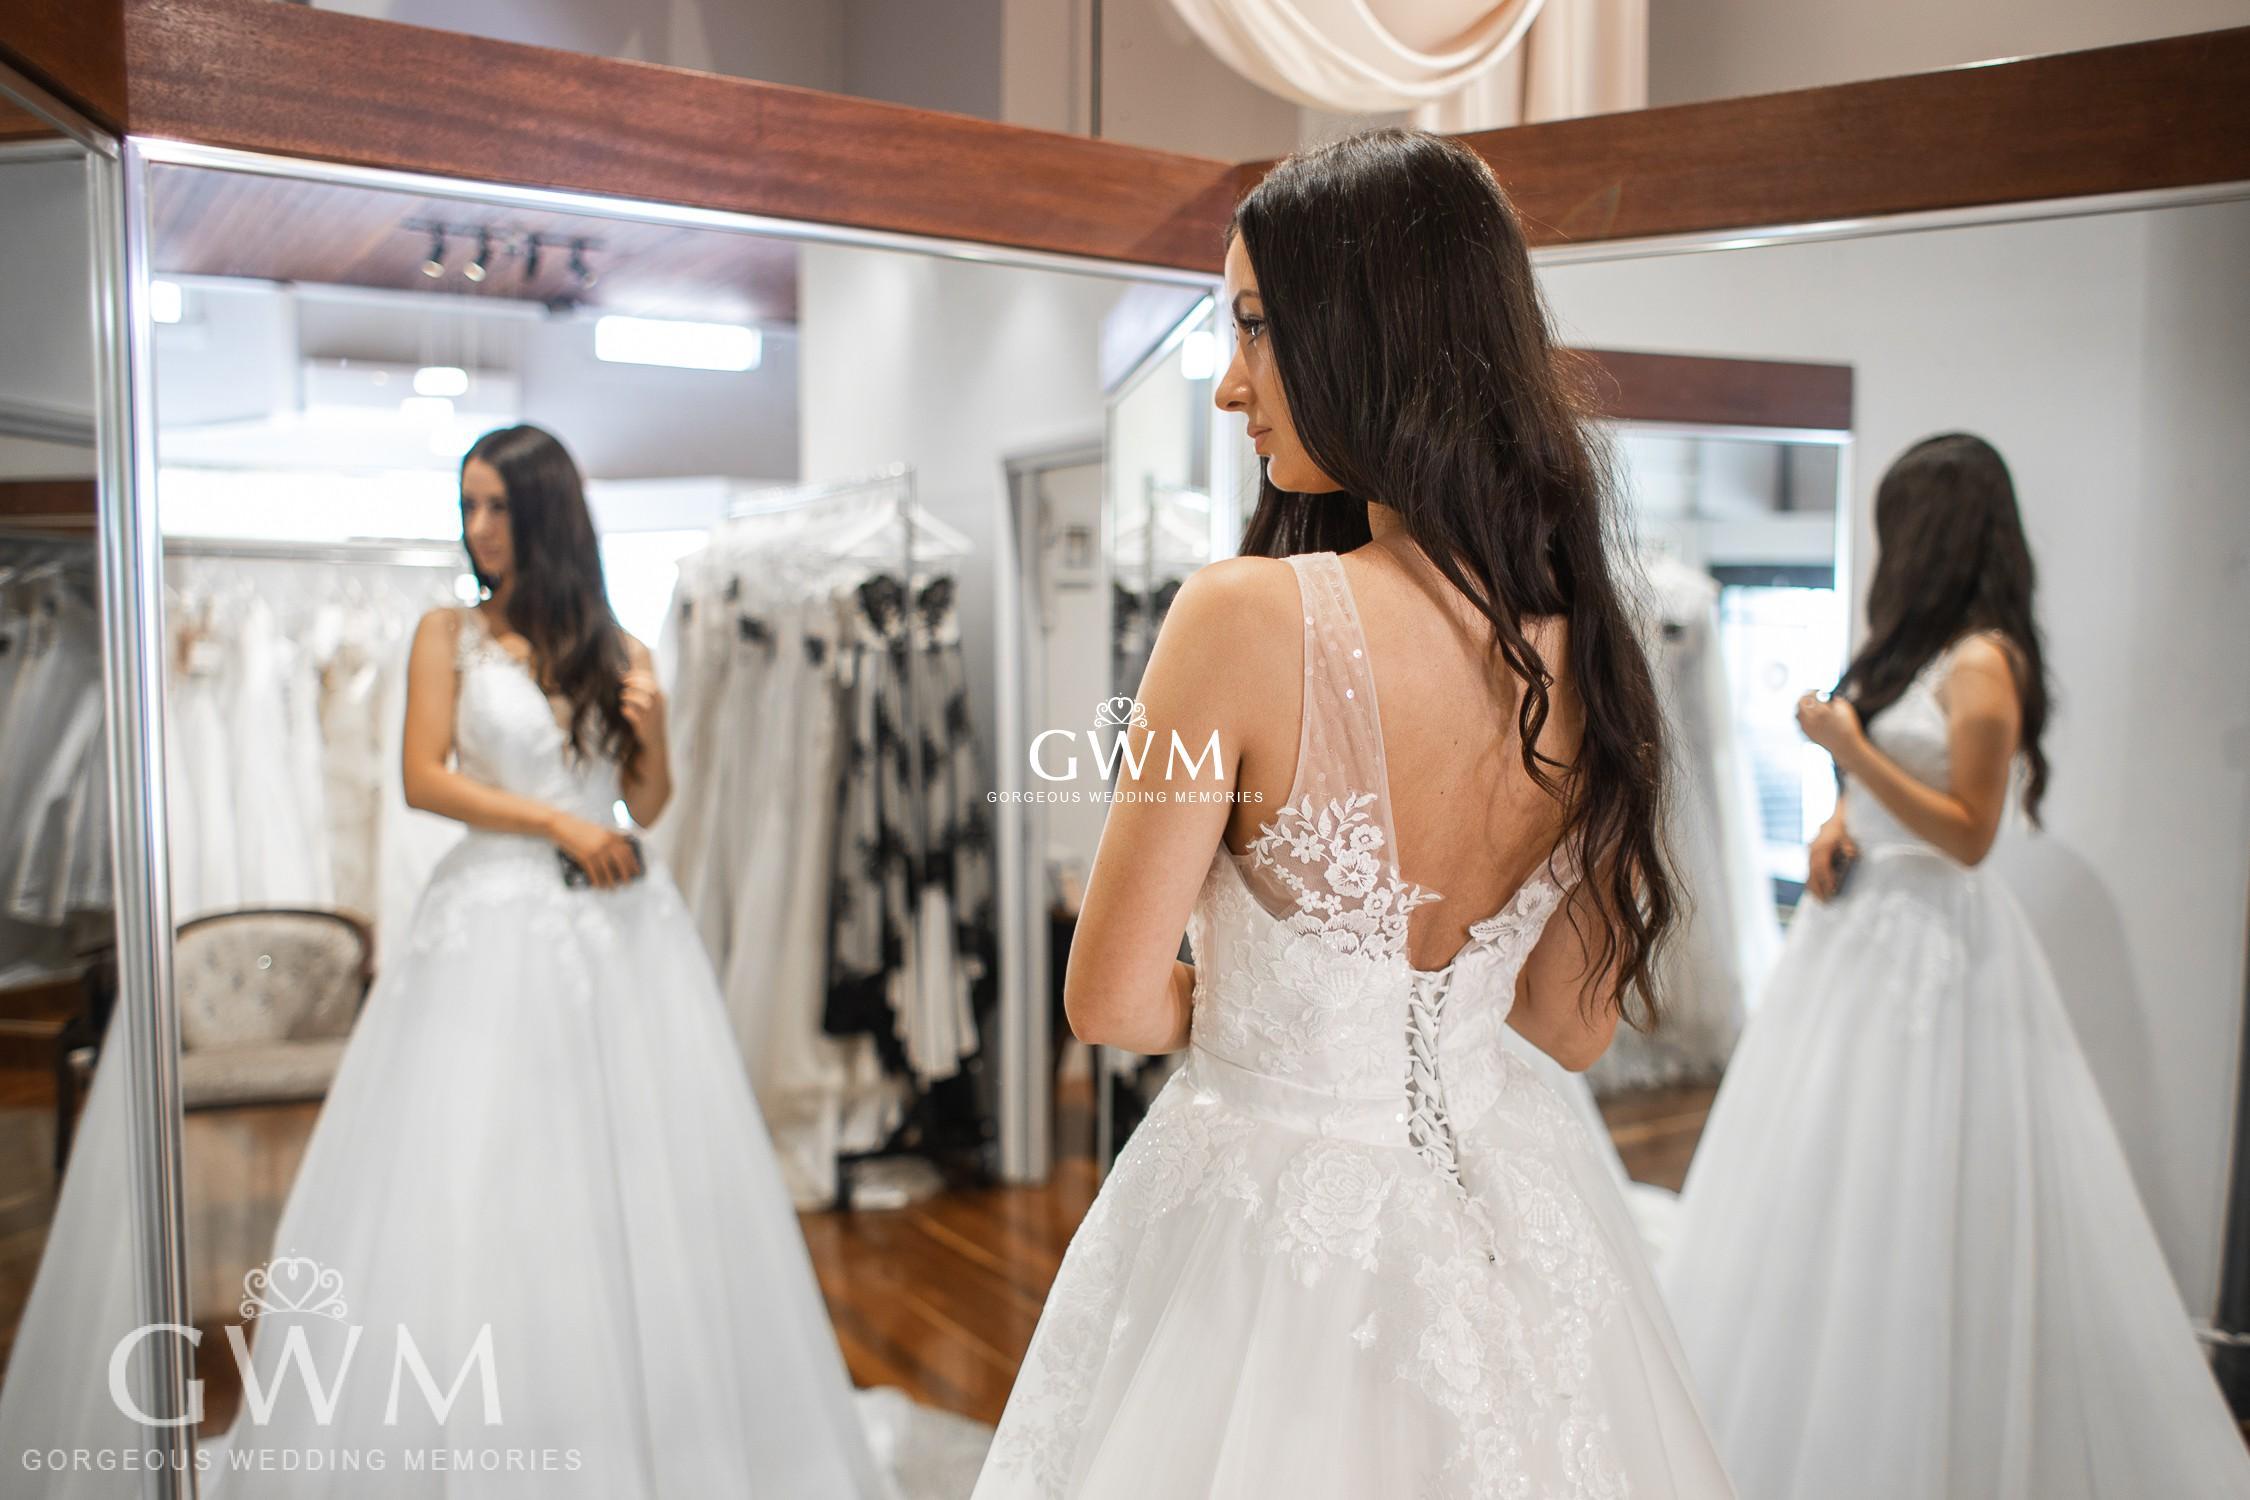 Waist Defining Bridal Hacks